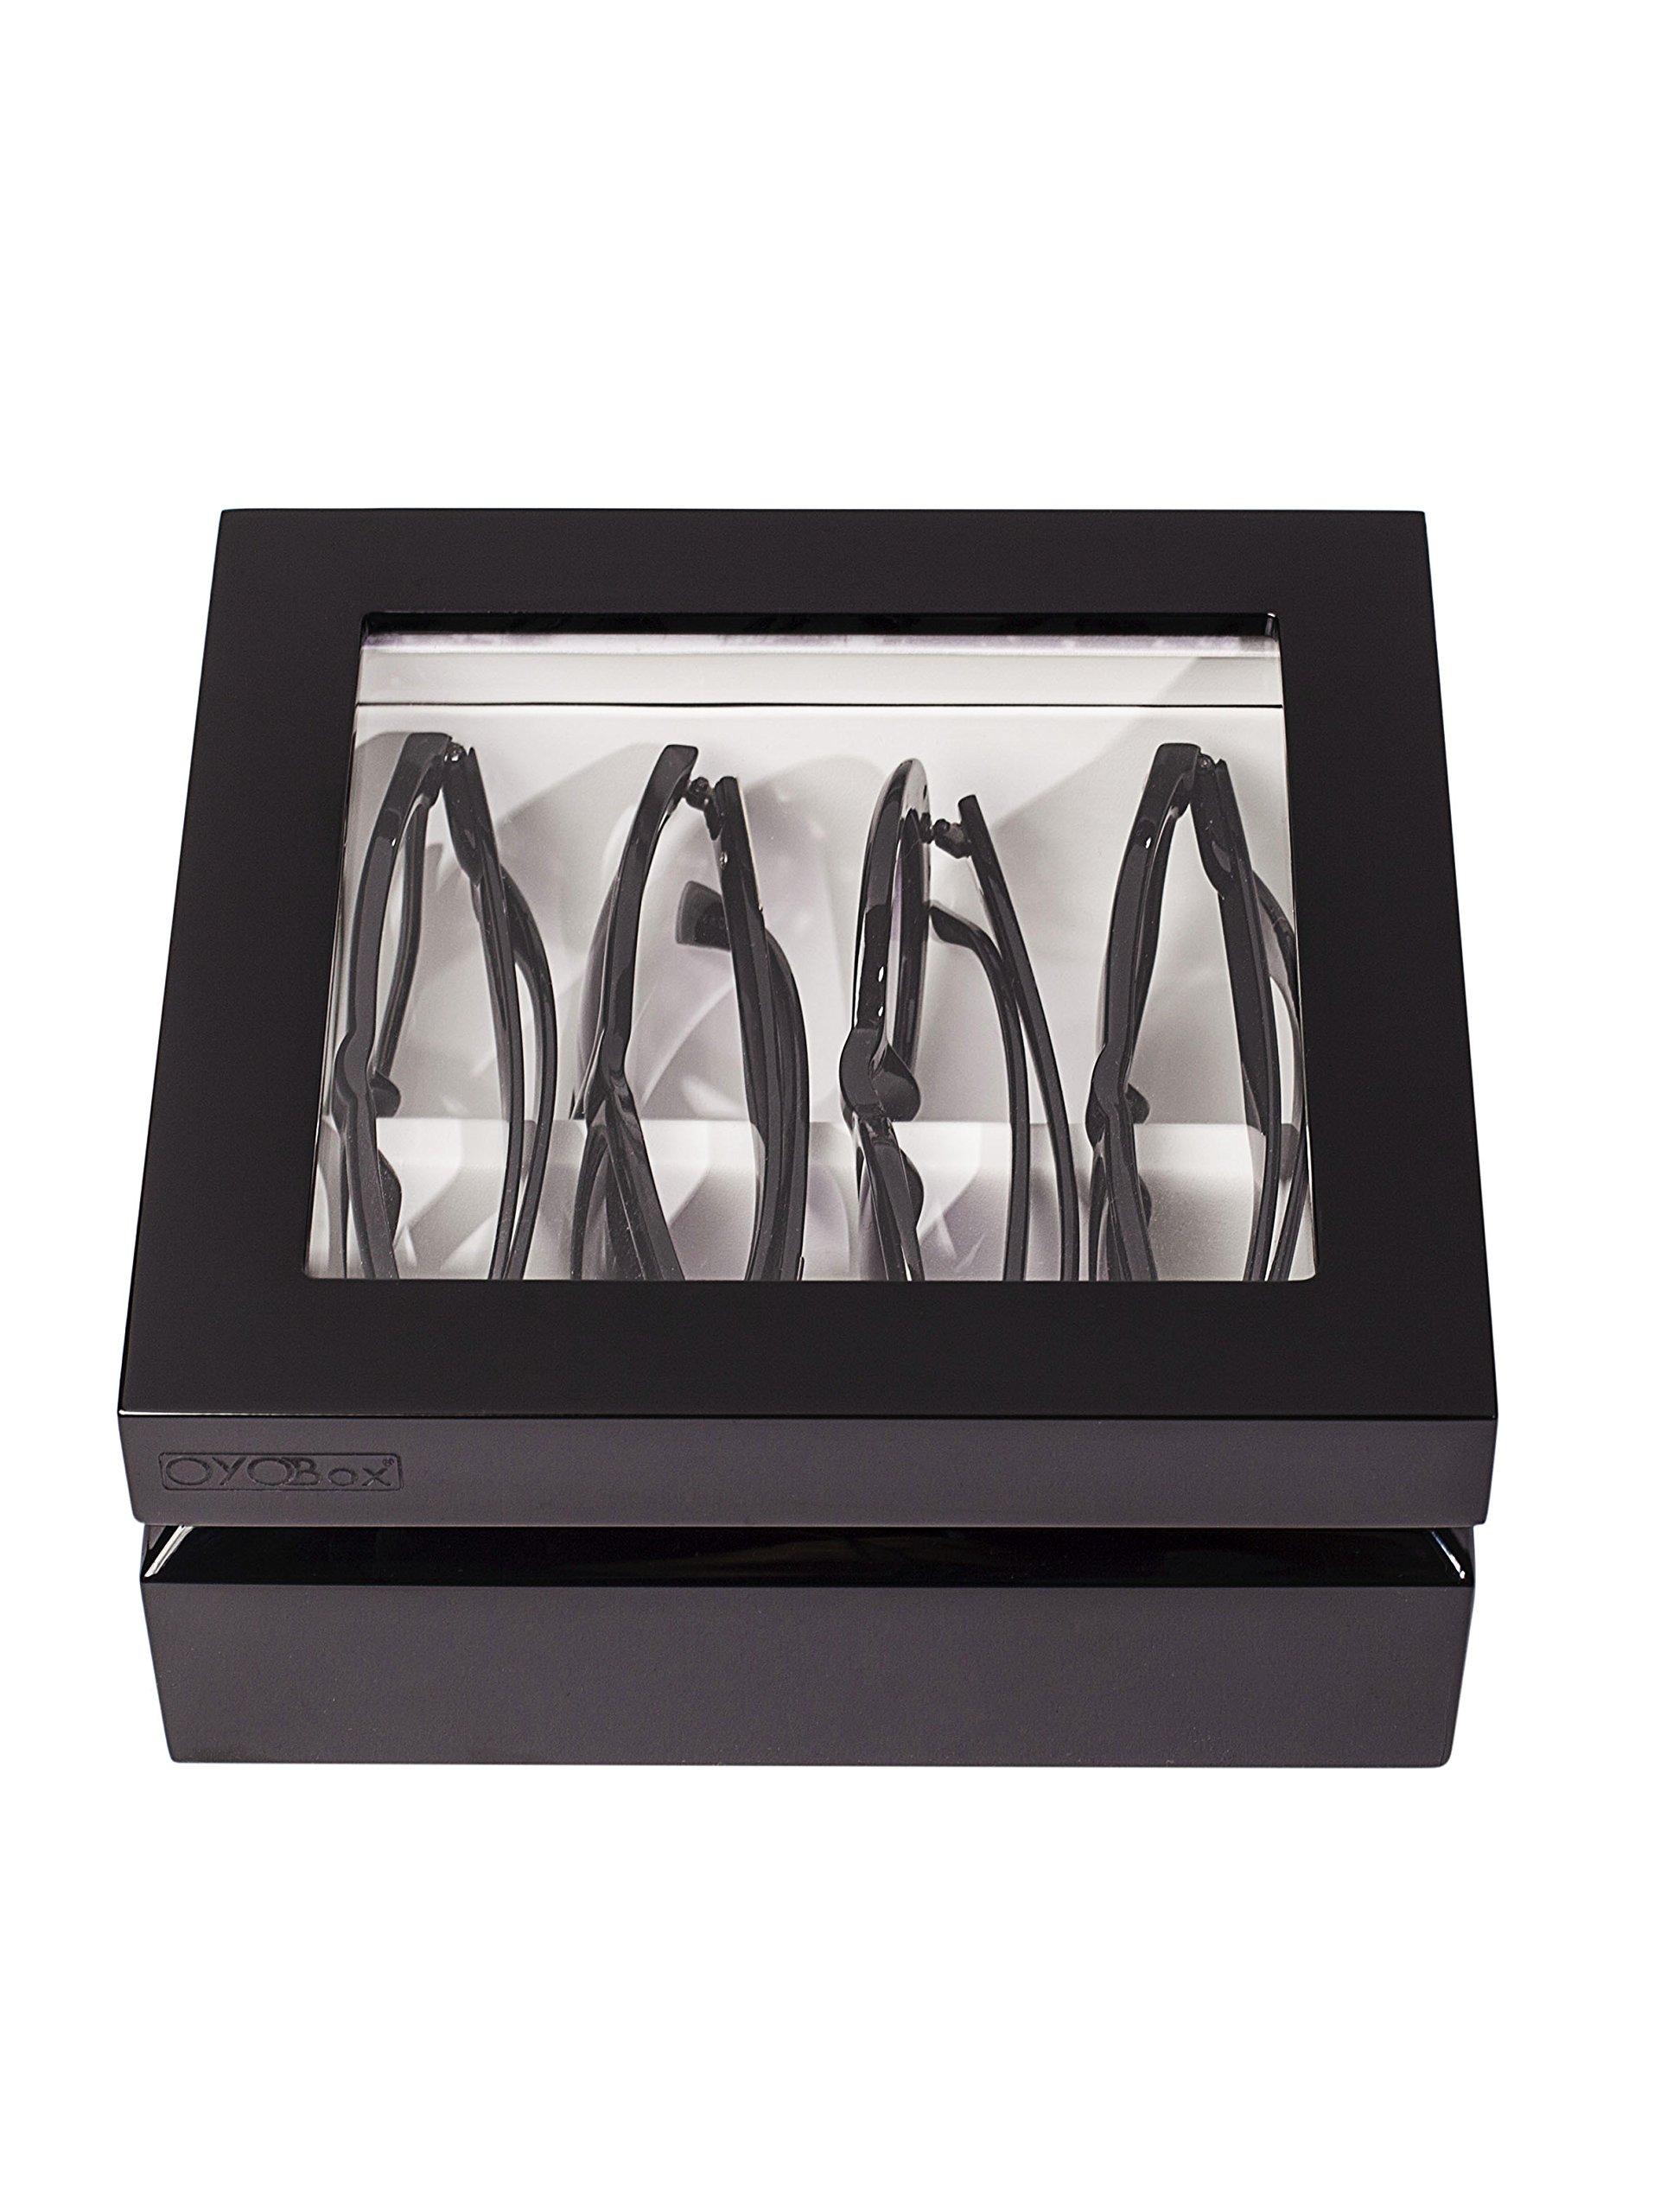 OYOBox Mini Luxury Eyewear Organizer, Wood Display Box for Glasses + Sunglasses (Black) by OYOBox